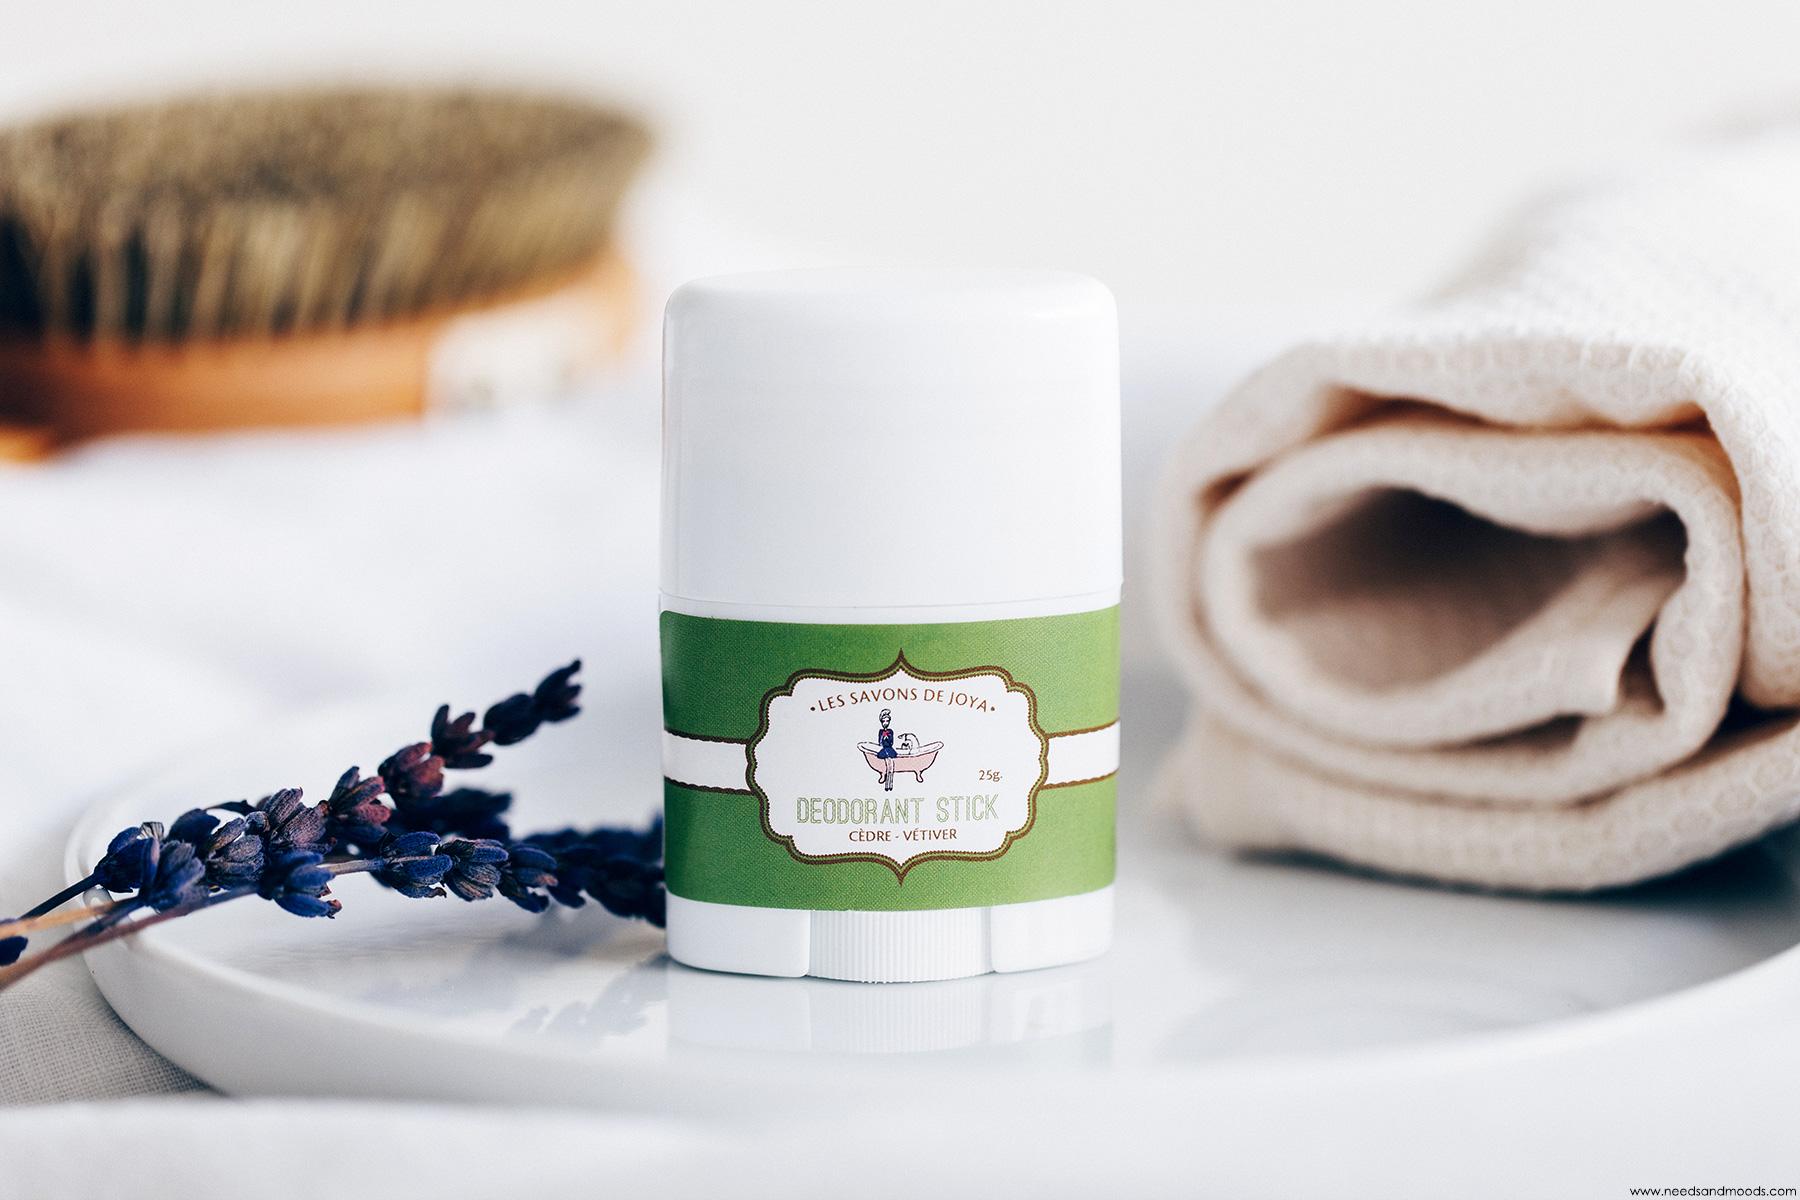 les savons de joya deodorant cedre vetiver